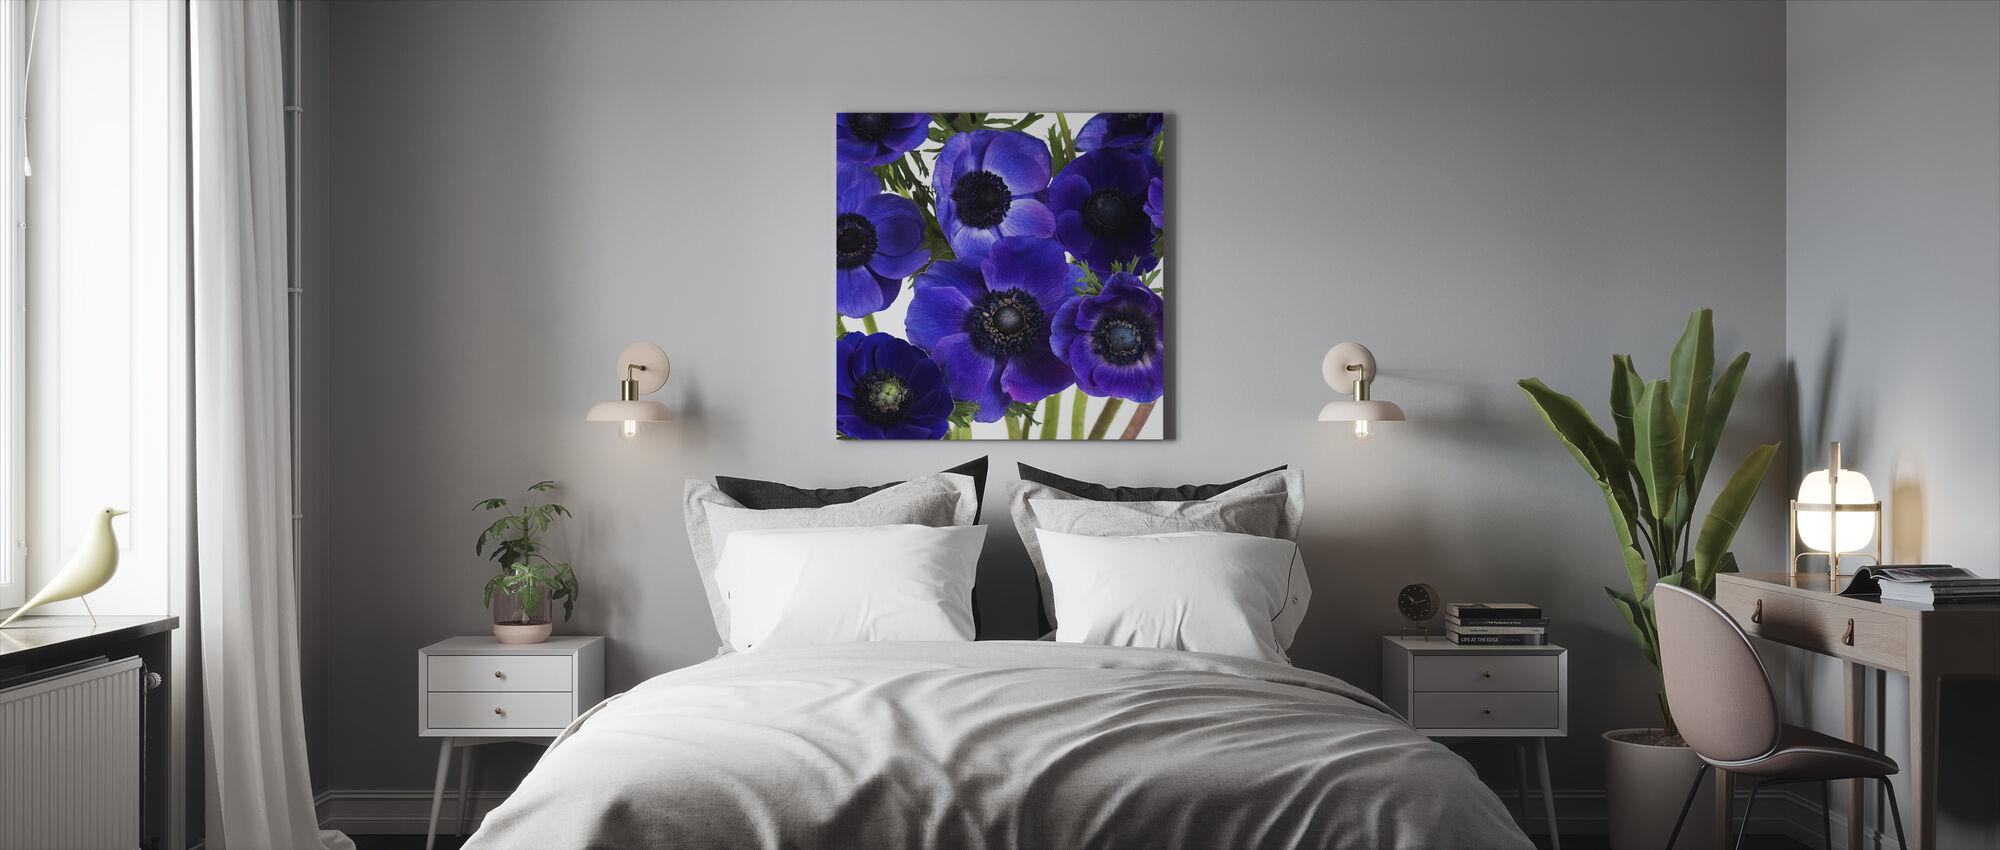 Blue Anemones - Canvas print - Bedroom